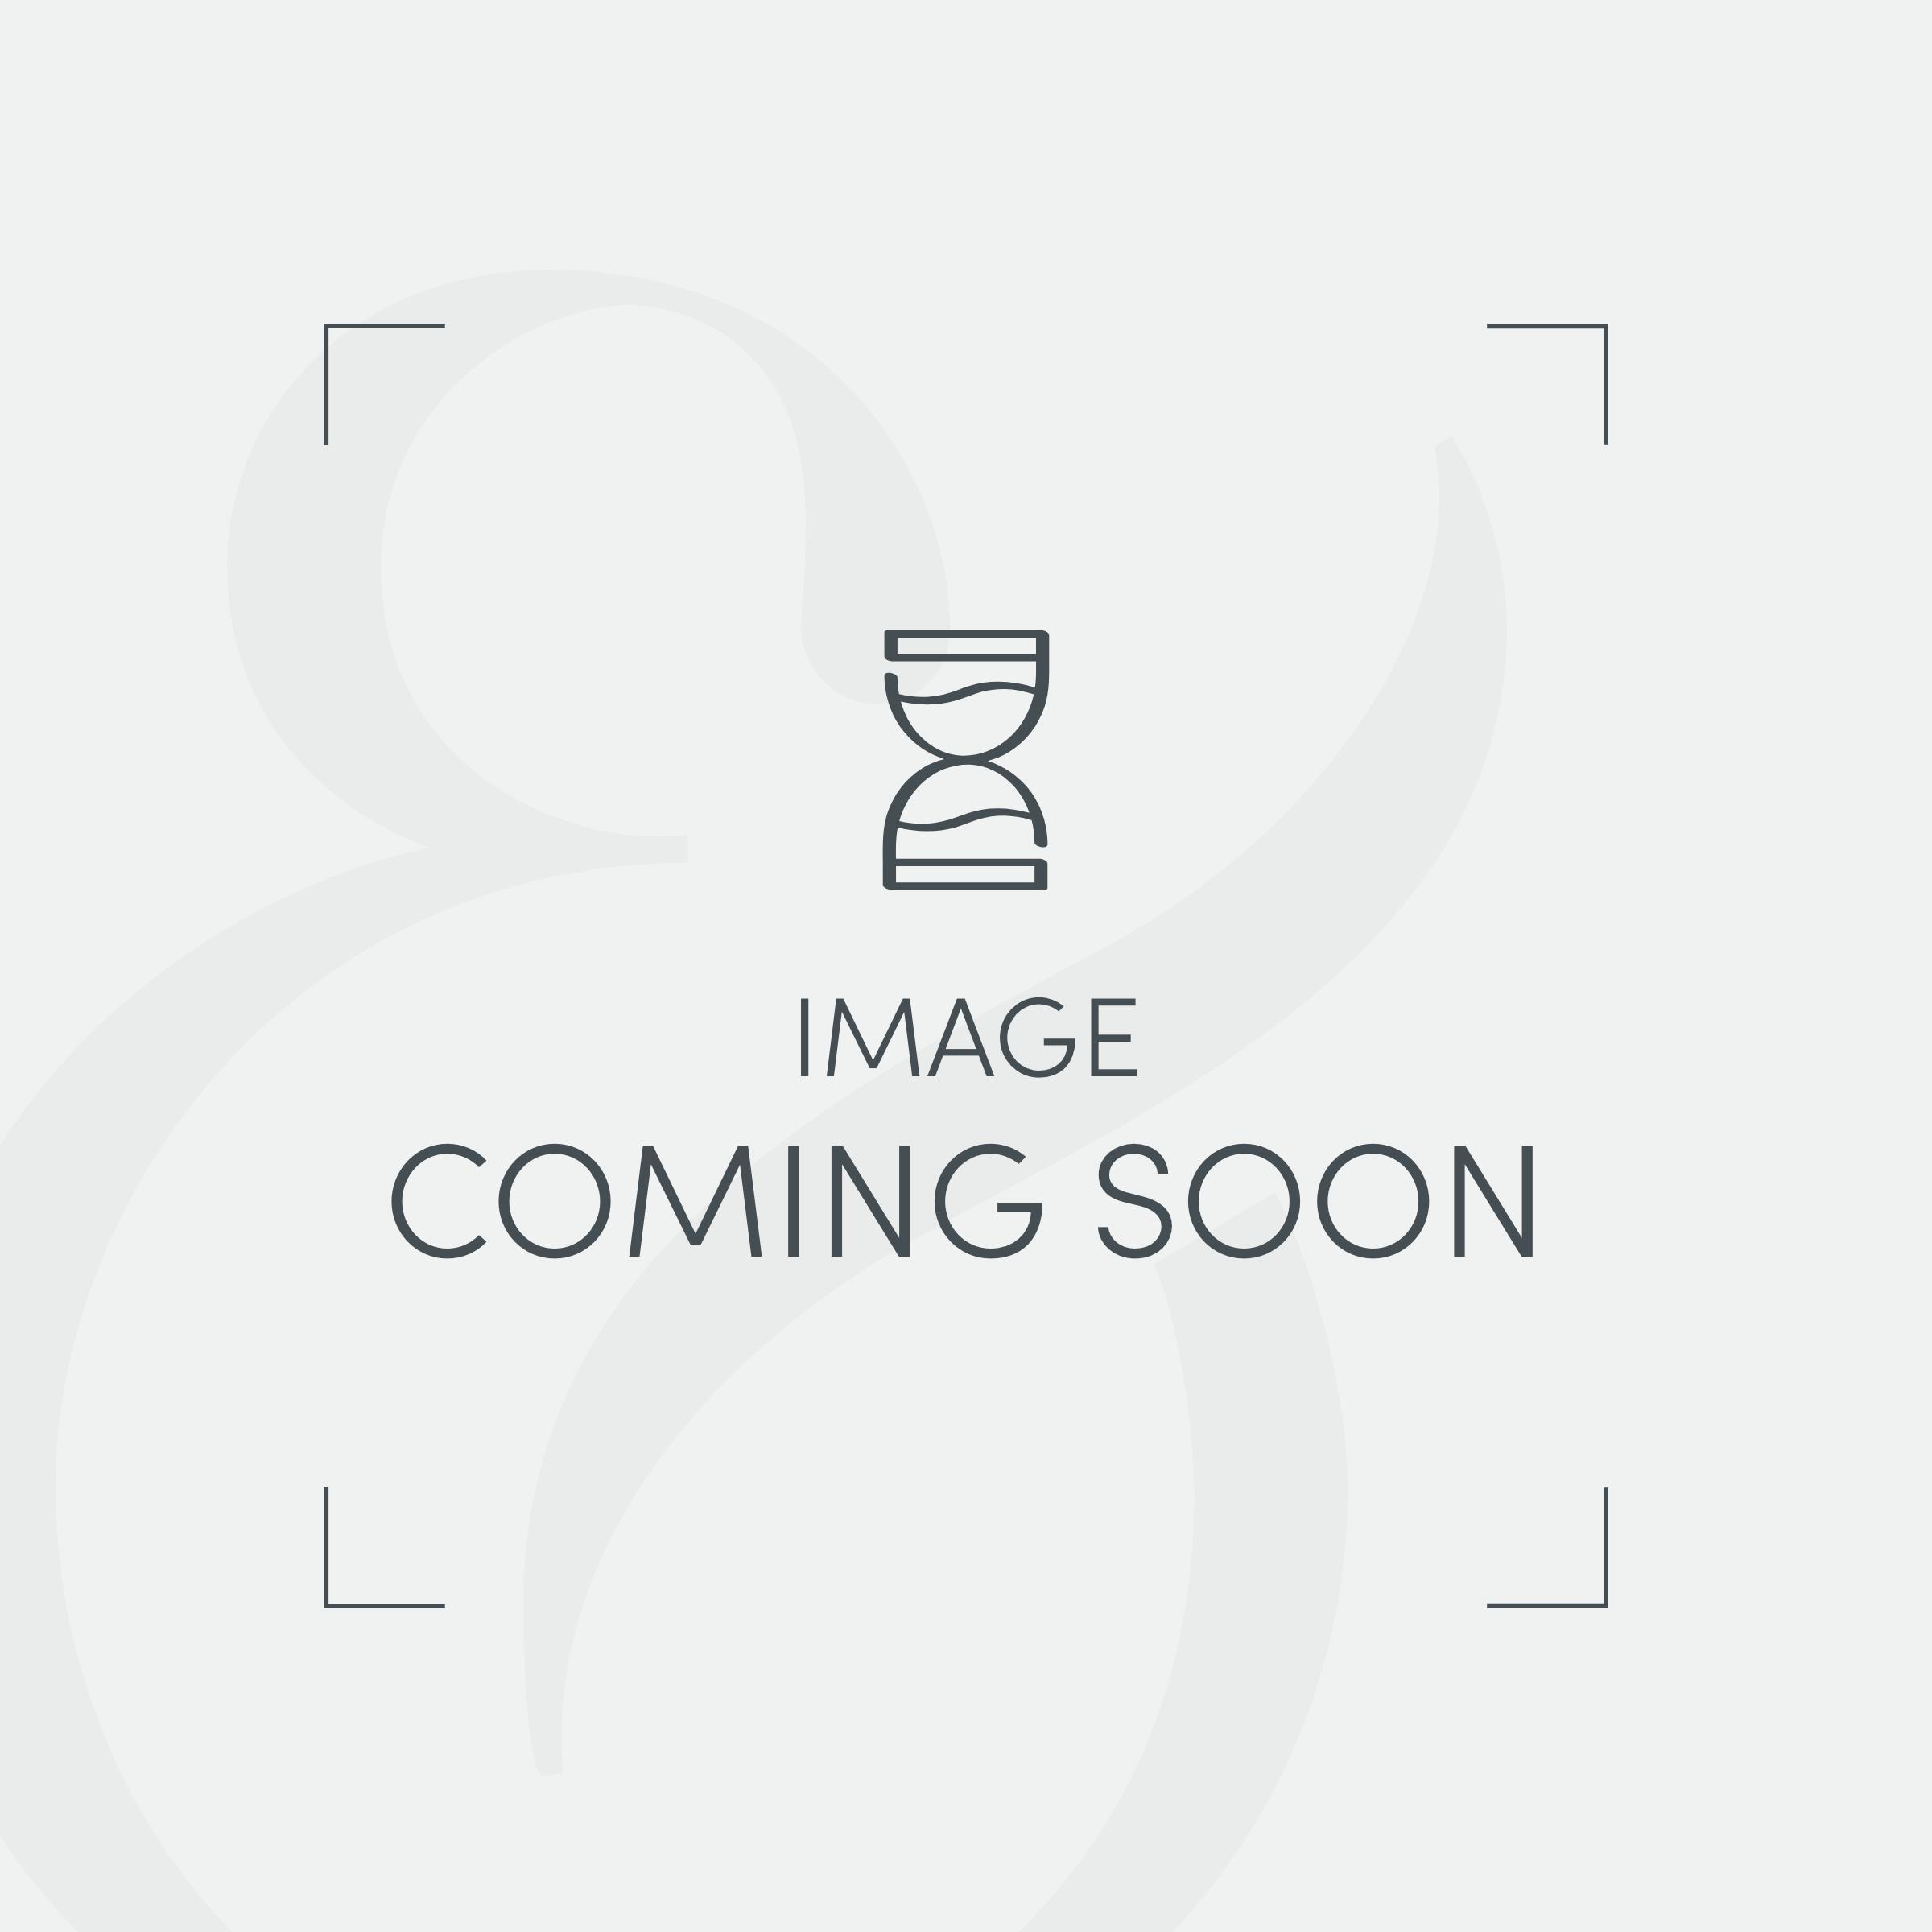 Luxury 600TC Egyptian Cotton Bundle - Dark Grey - Double (Duvet Cover, Deep Fitted Sheet, Standard Oxford Pillowcase Pair)